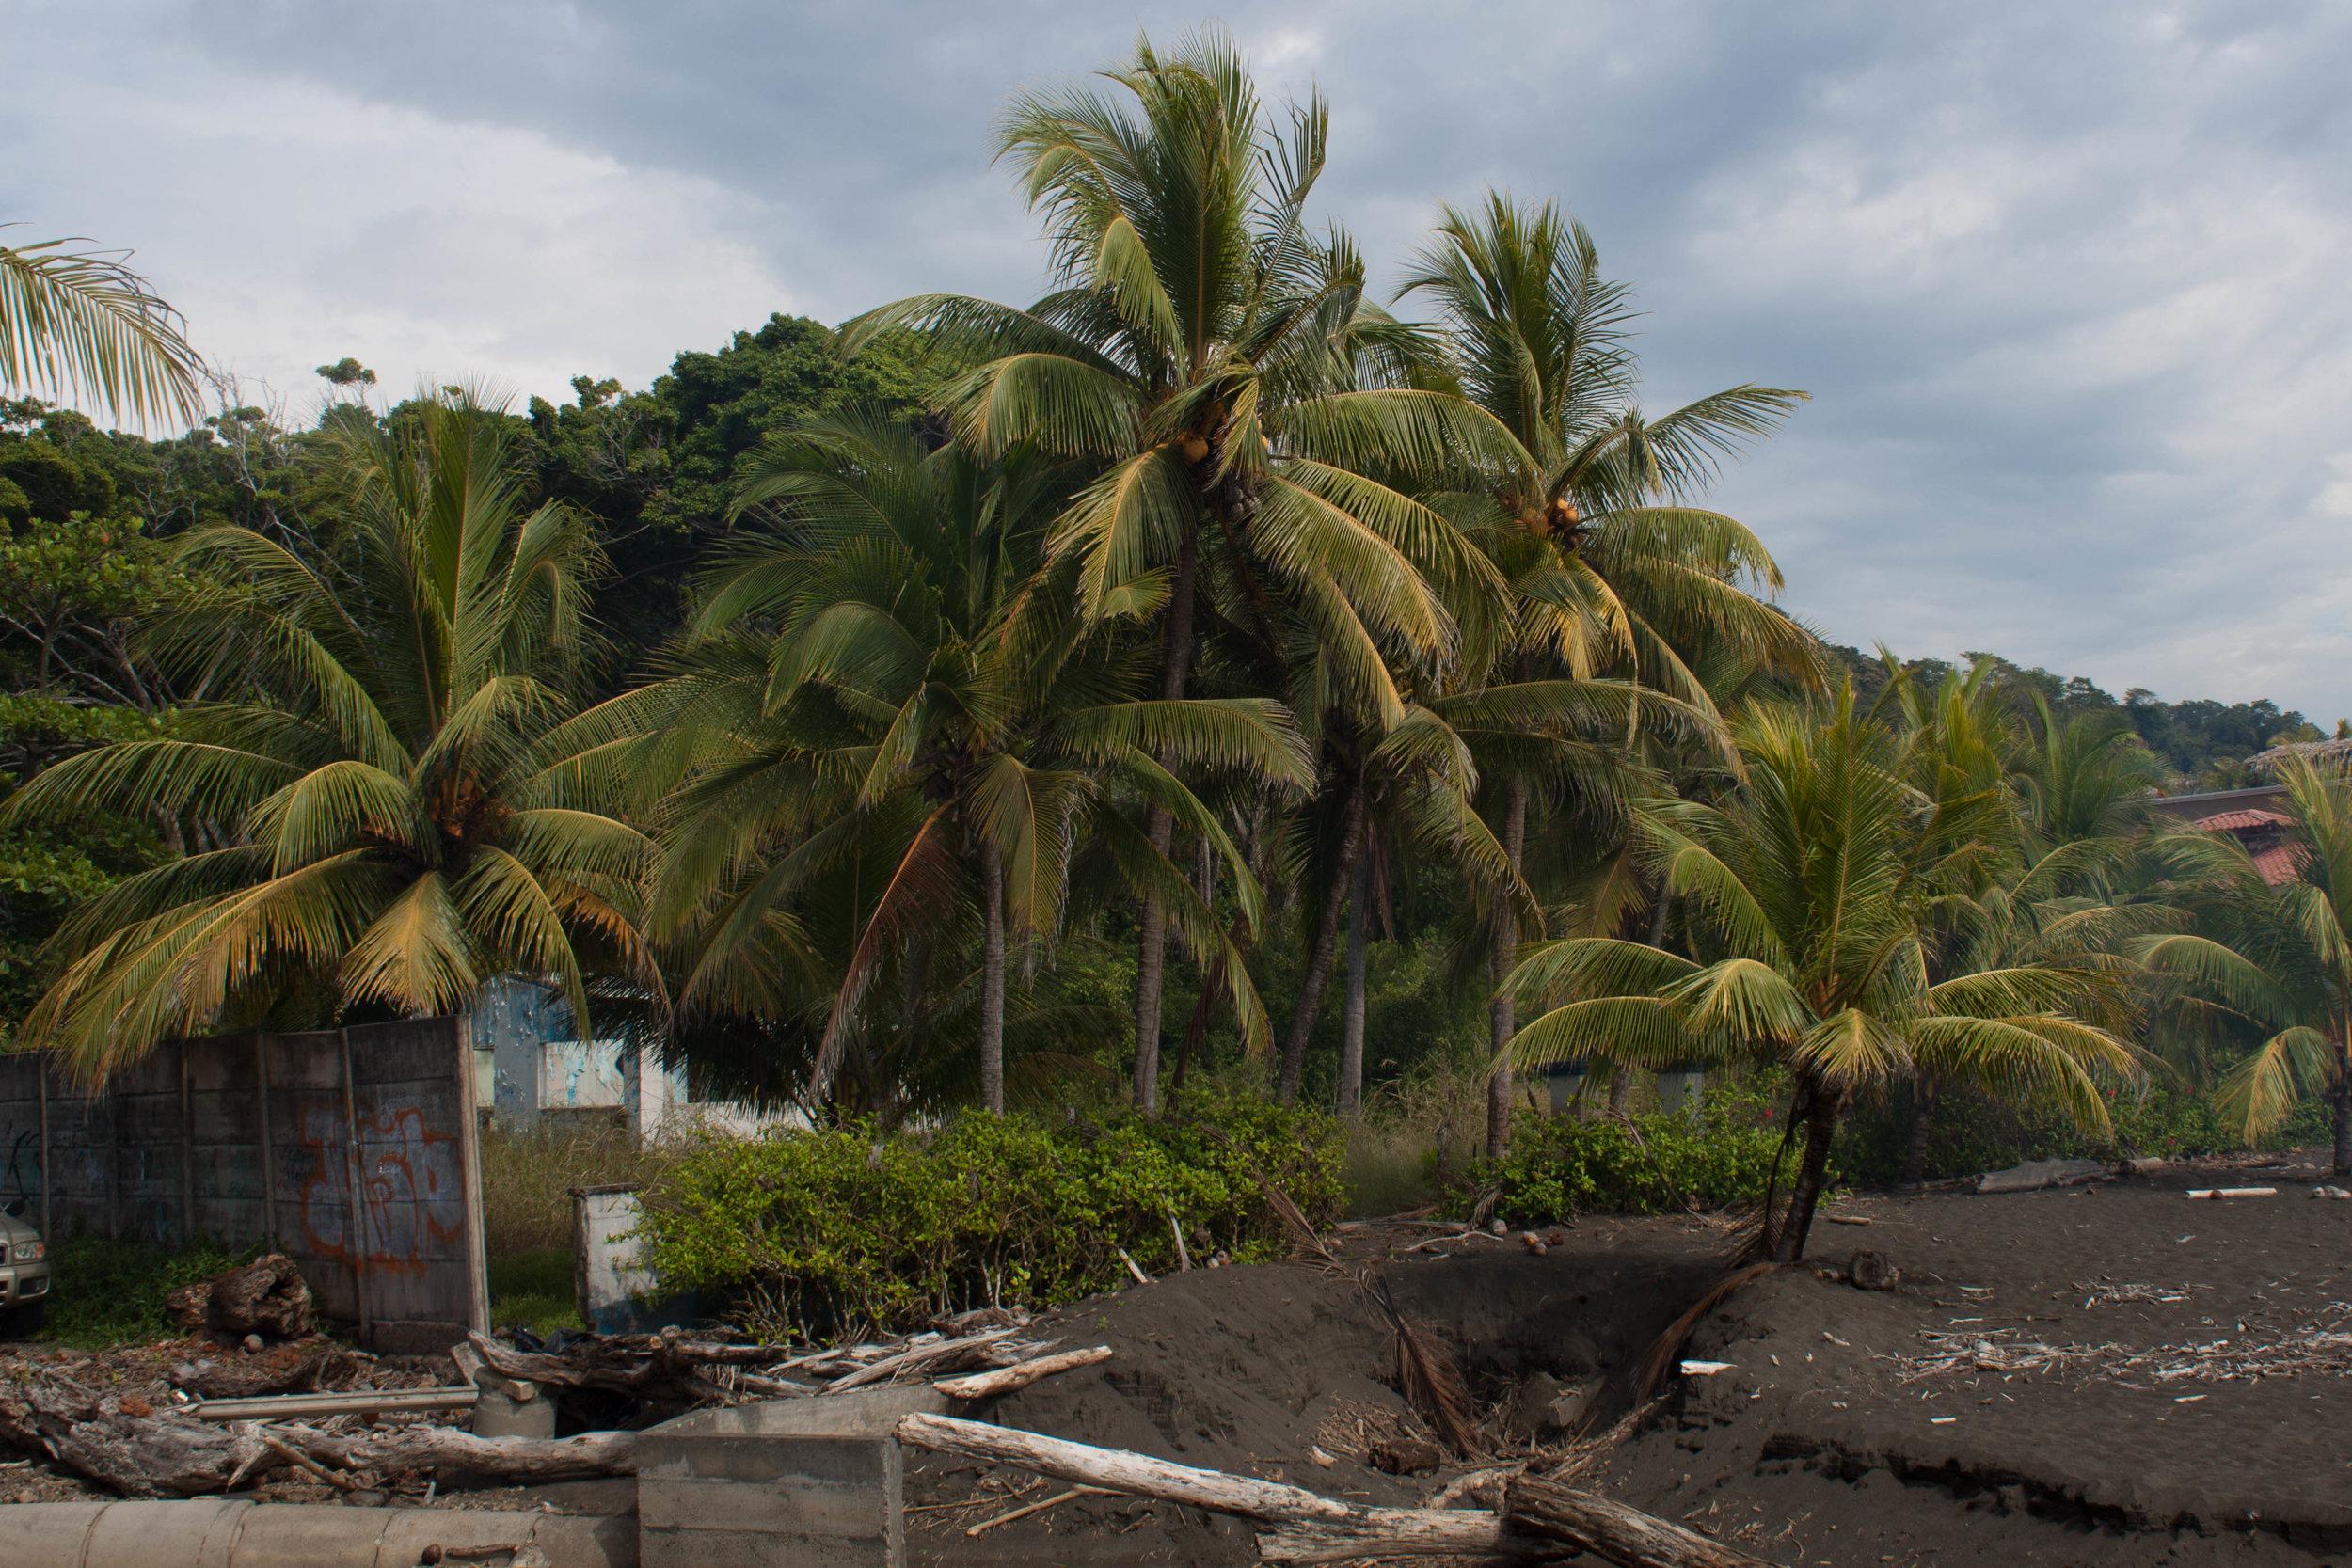 black sand palms - playa hermosa, costa rica